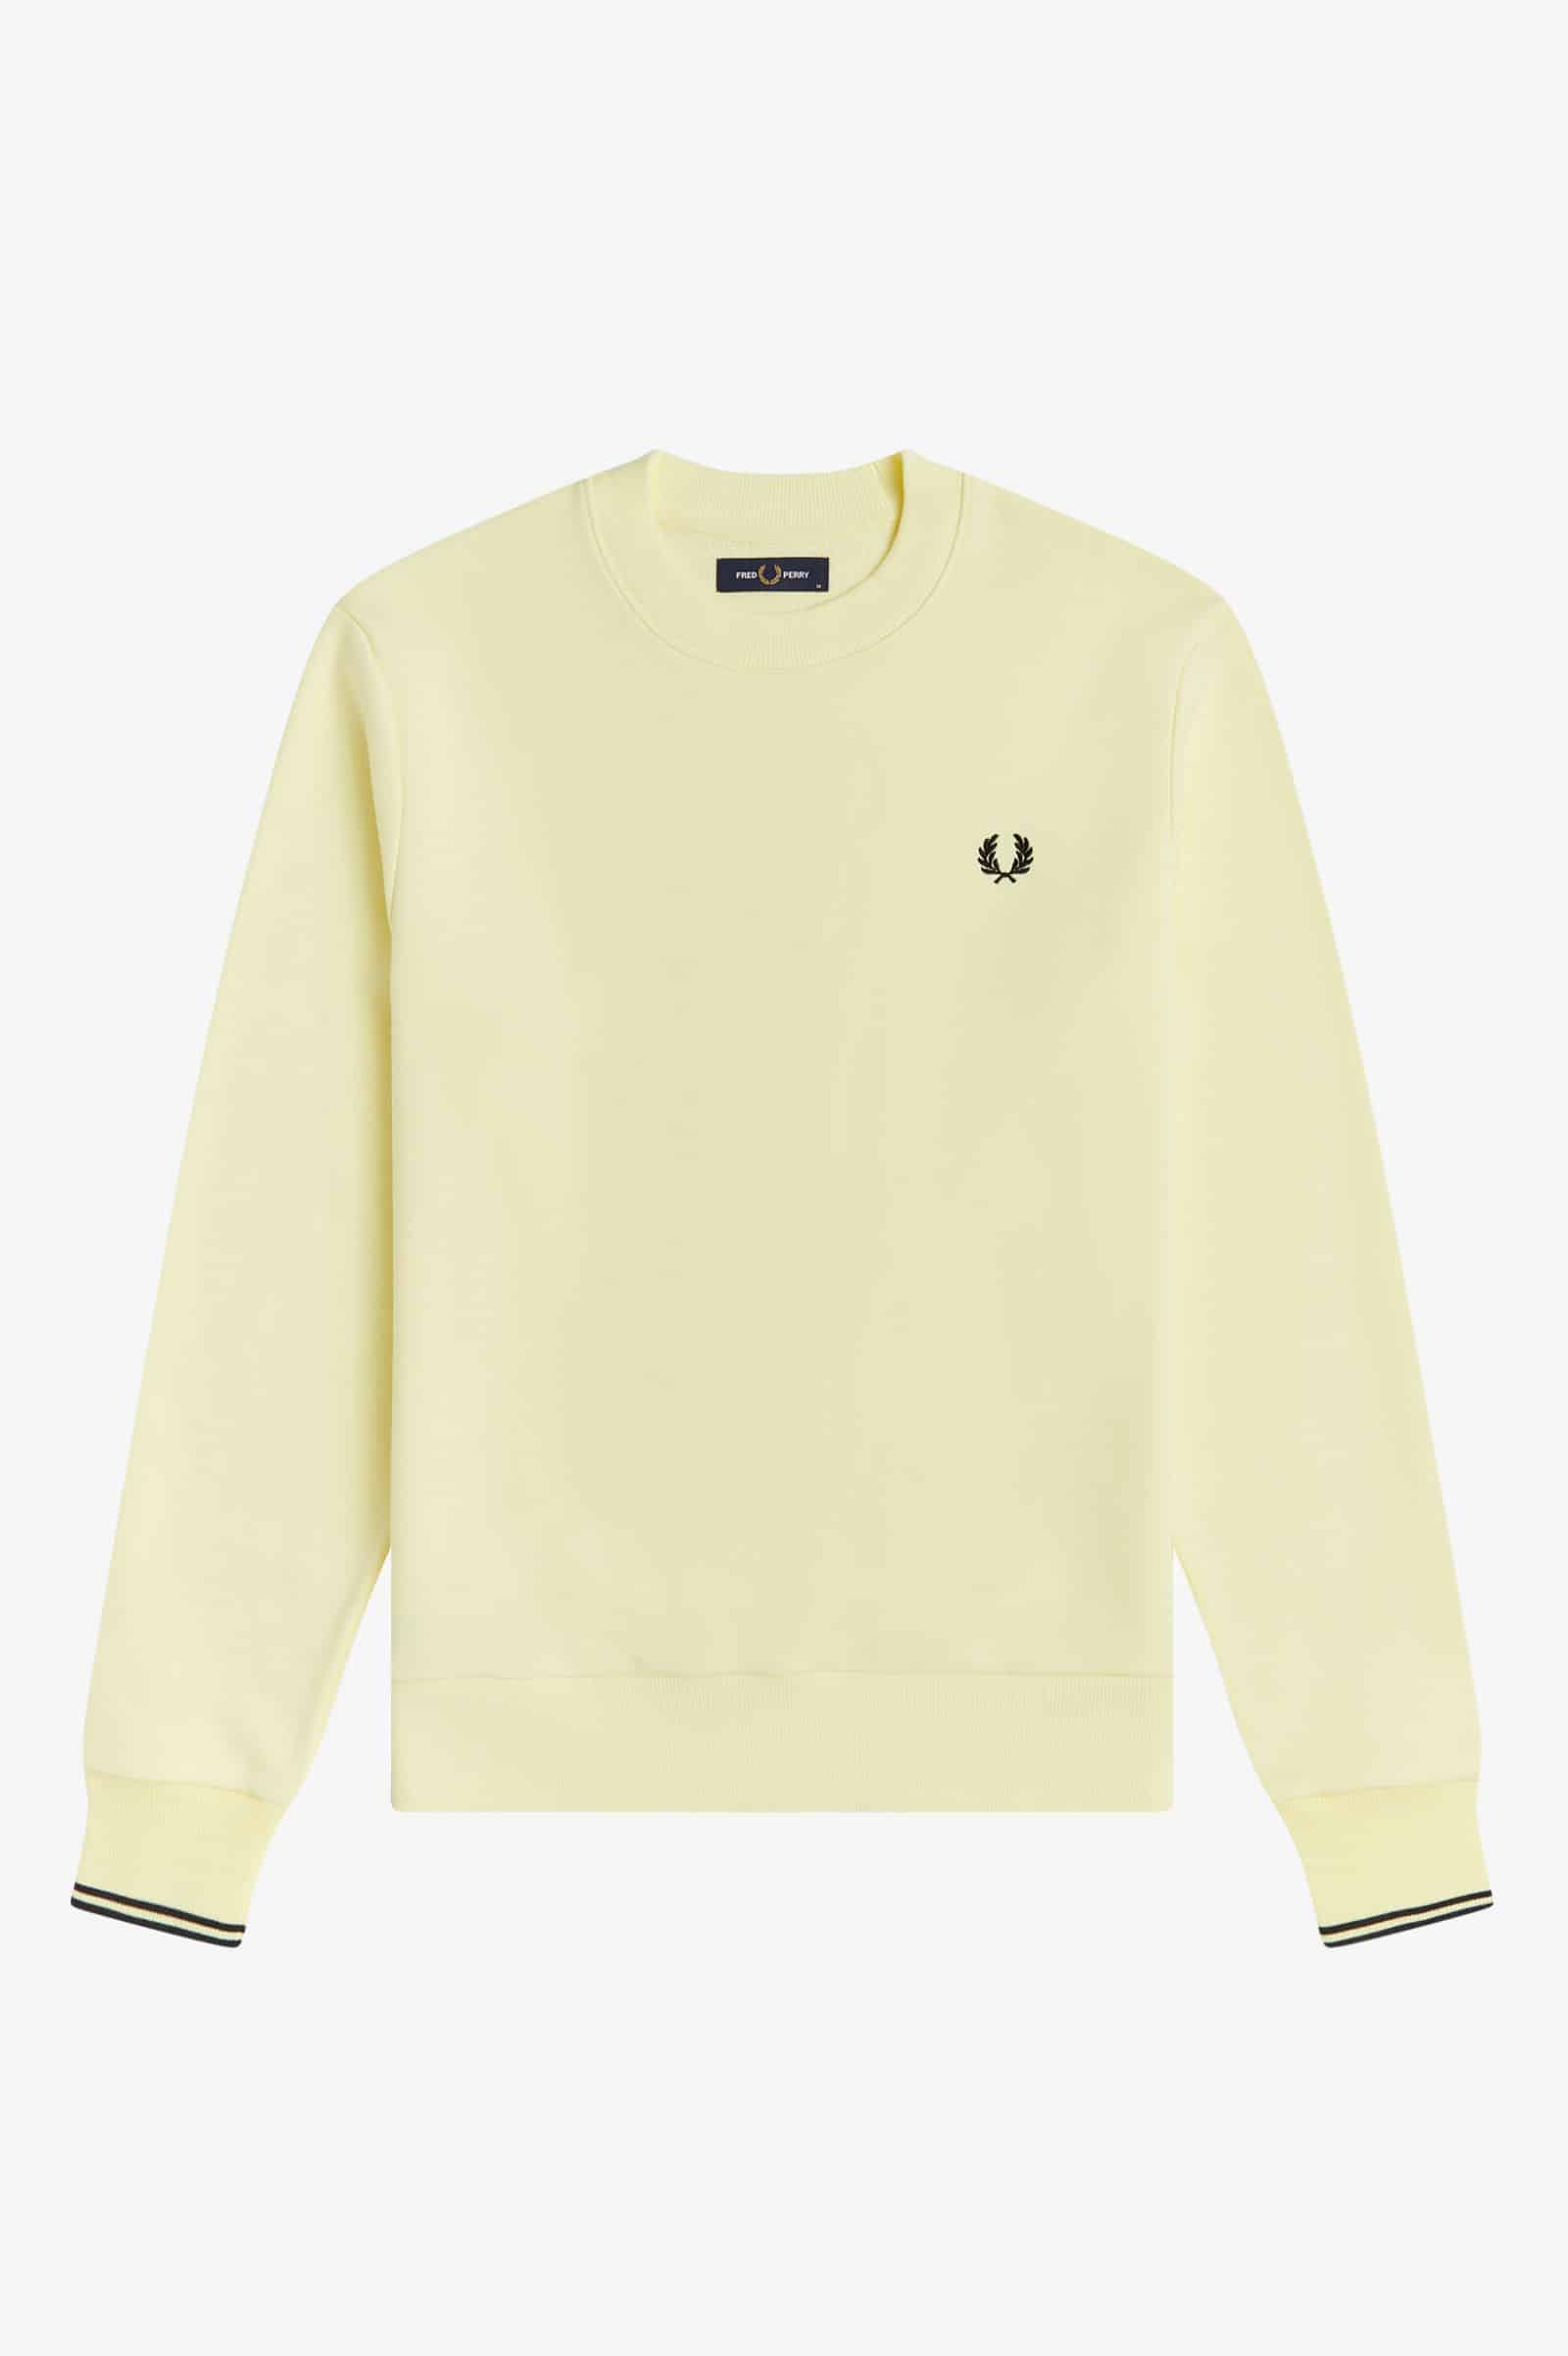 Fred Perry Crew Neck Sweatshirt Yellow